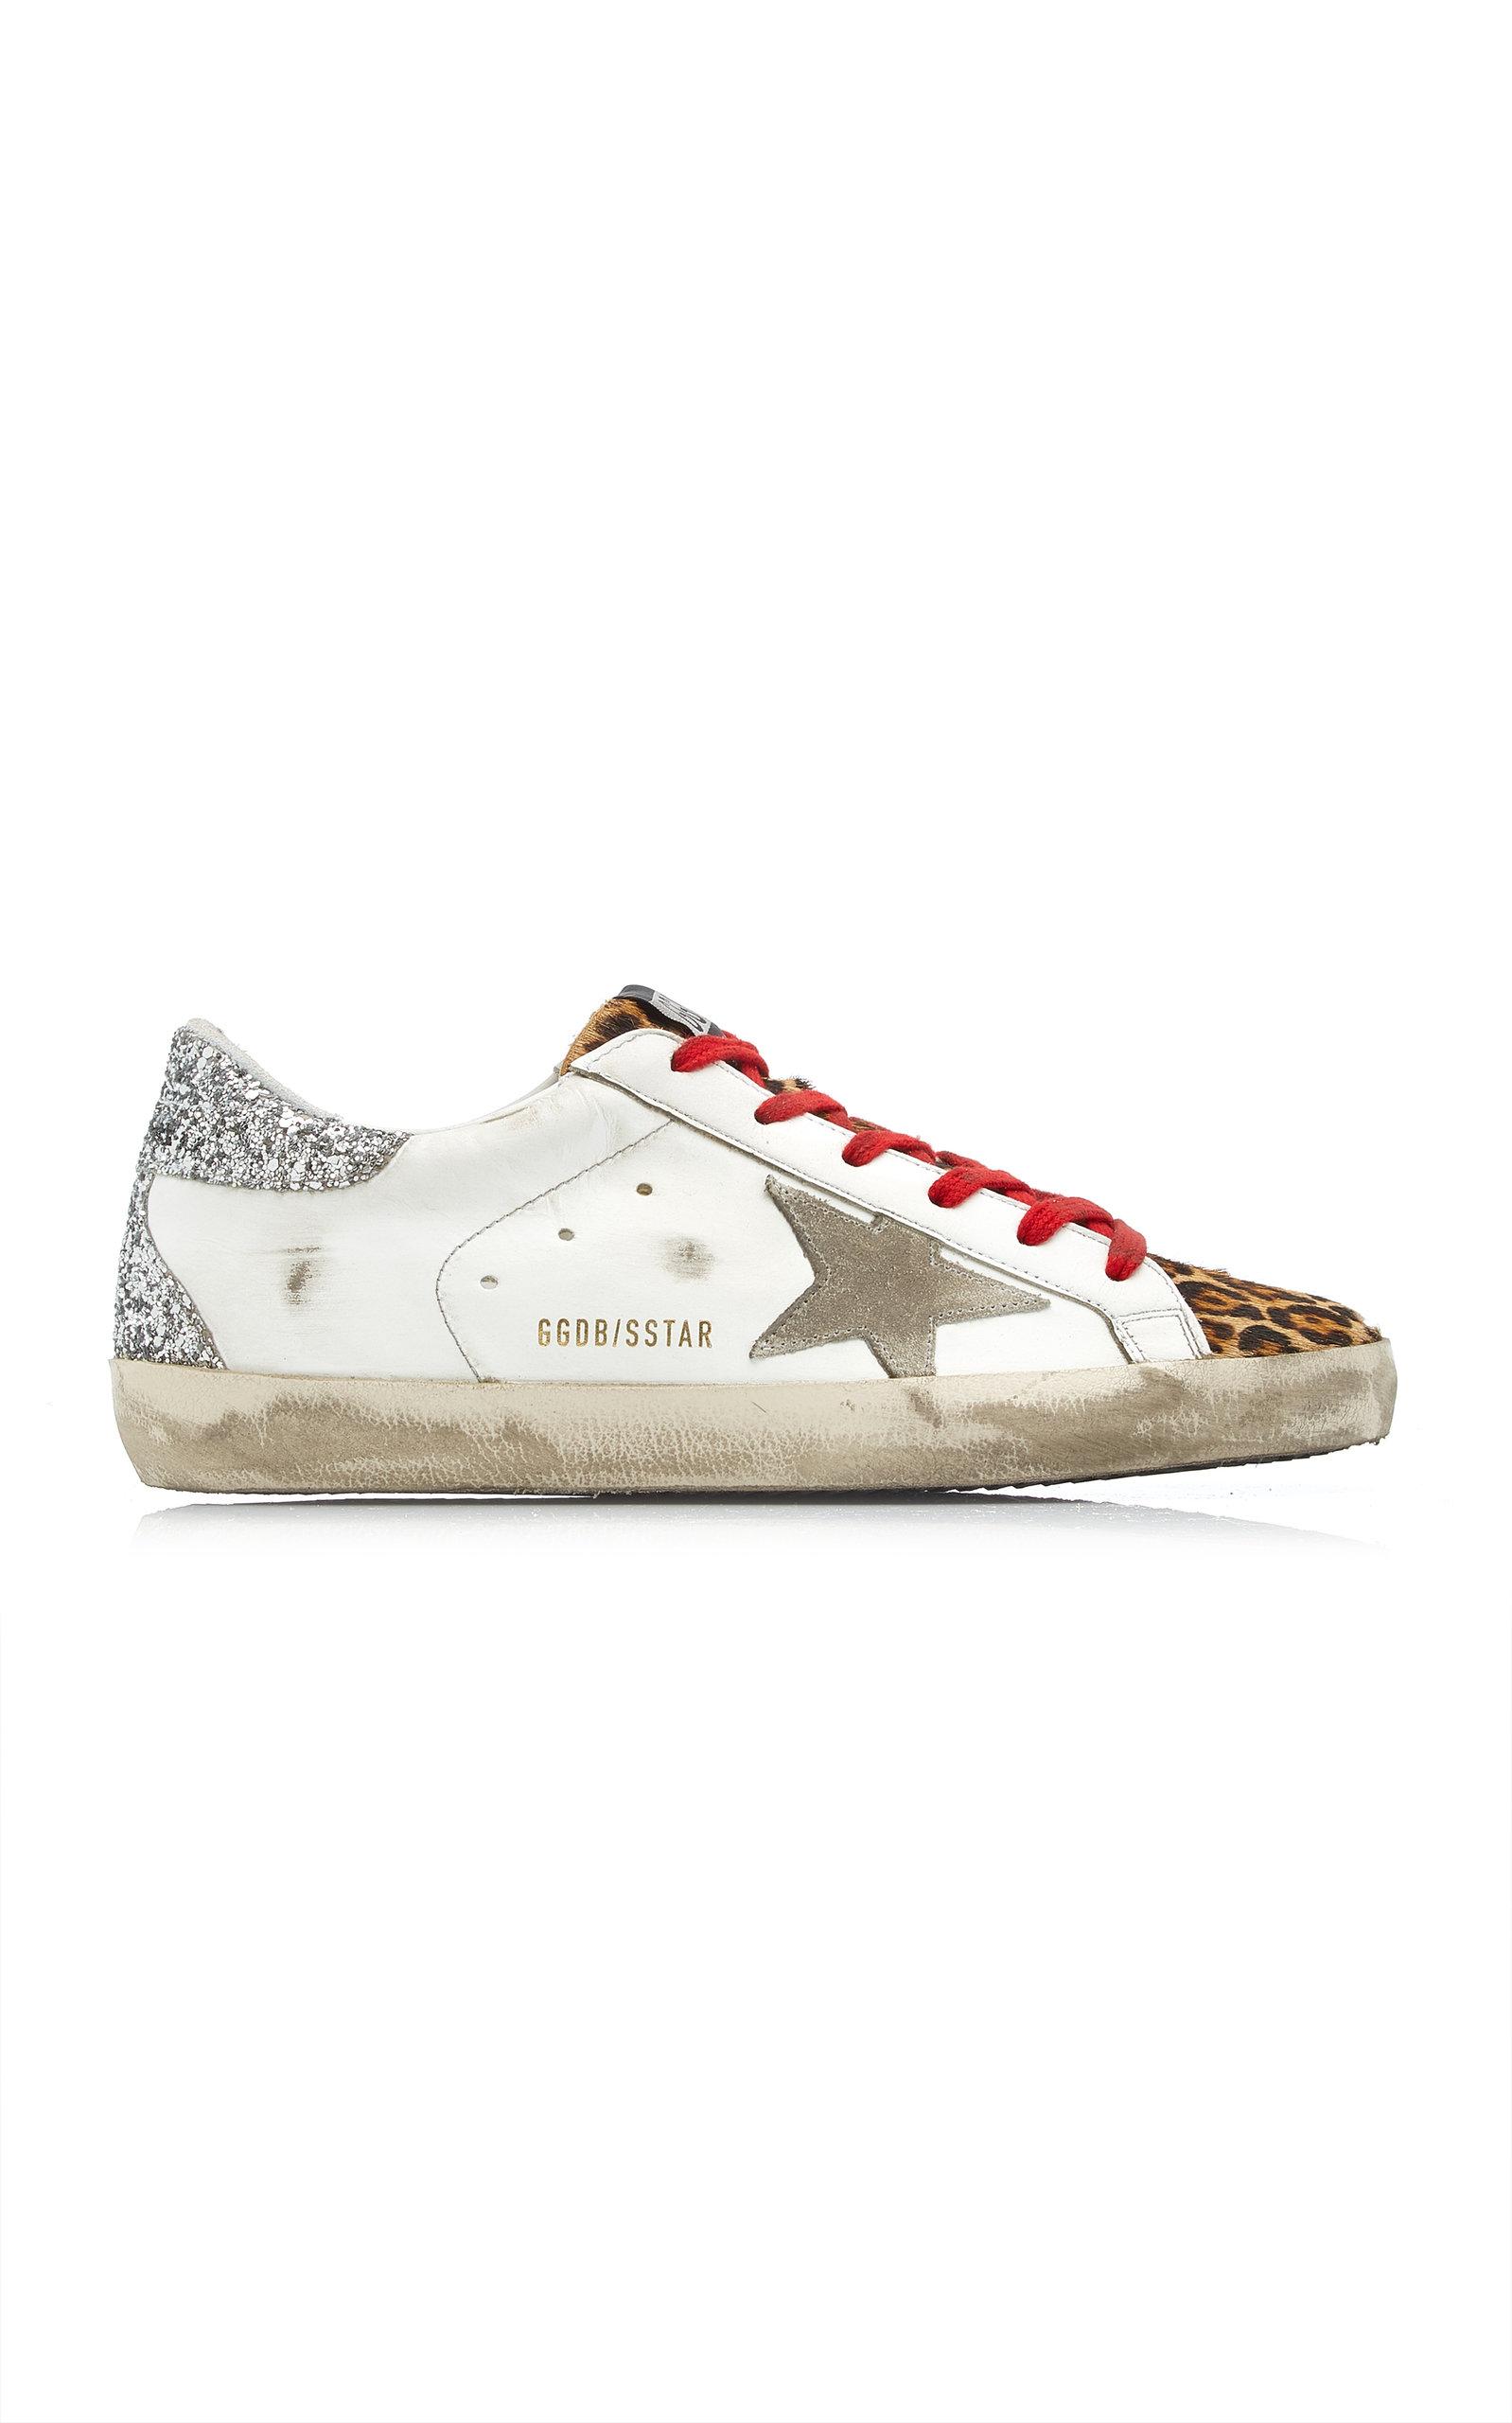 Golden Goose - Women's Superstar Suede and Leopard Leather Sneakers - Multi - Moda Operandi